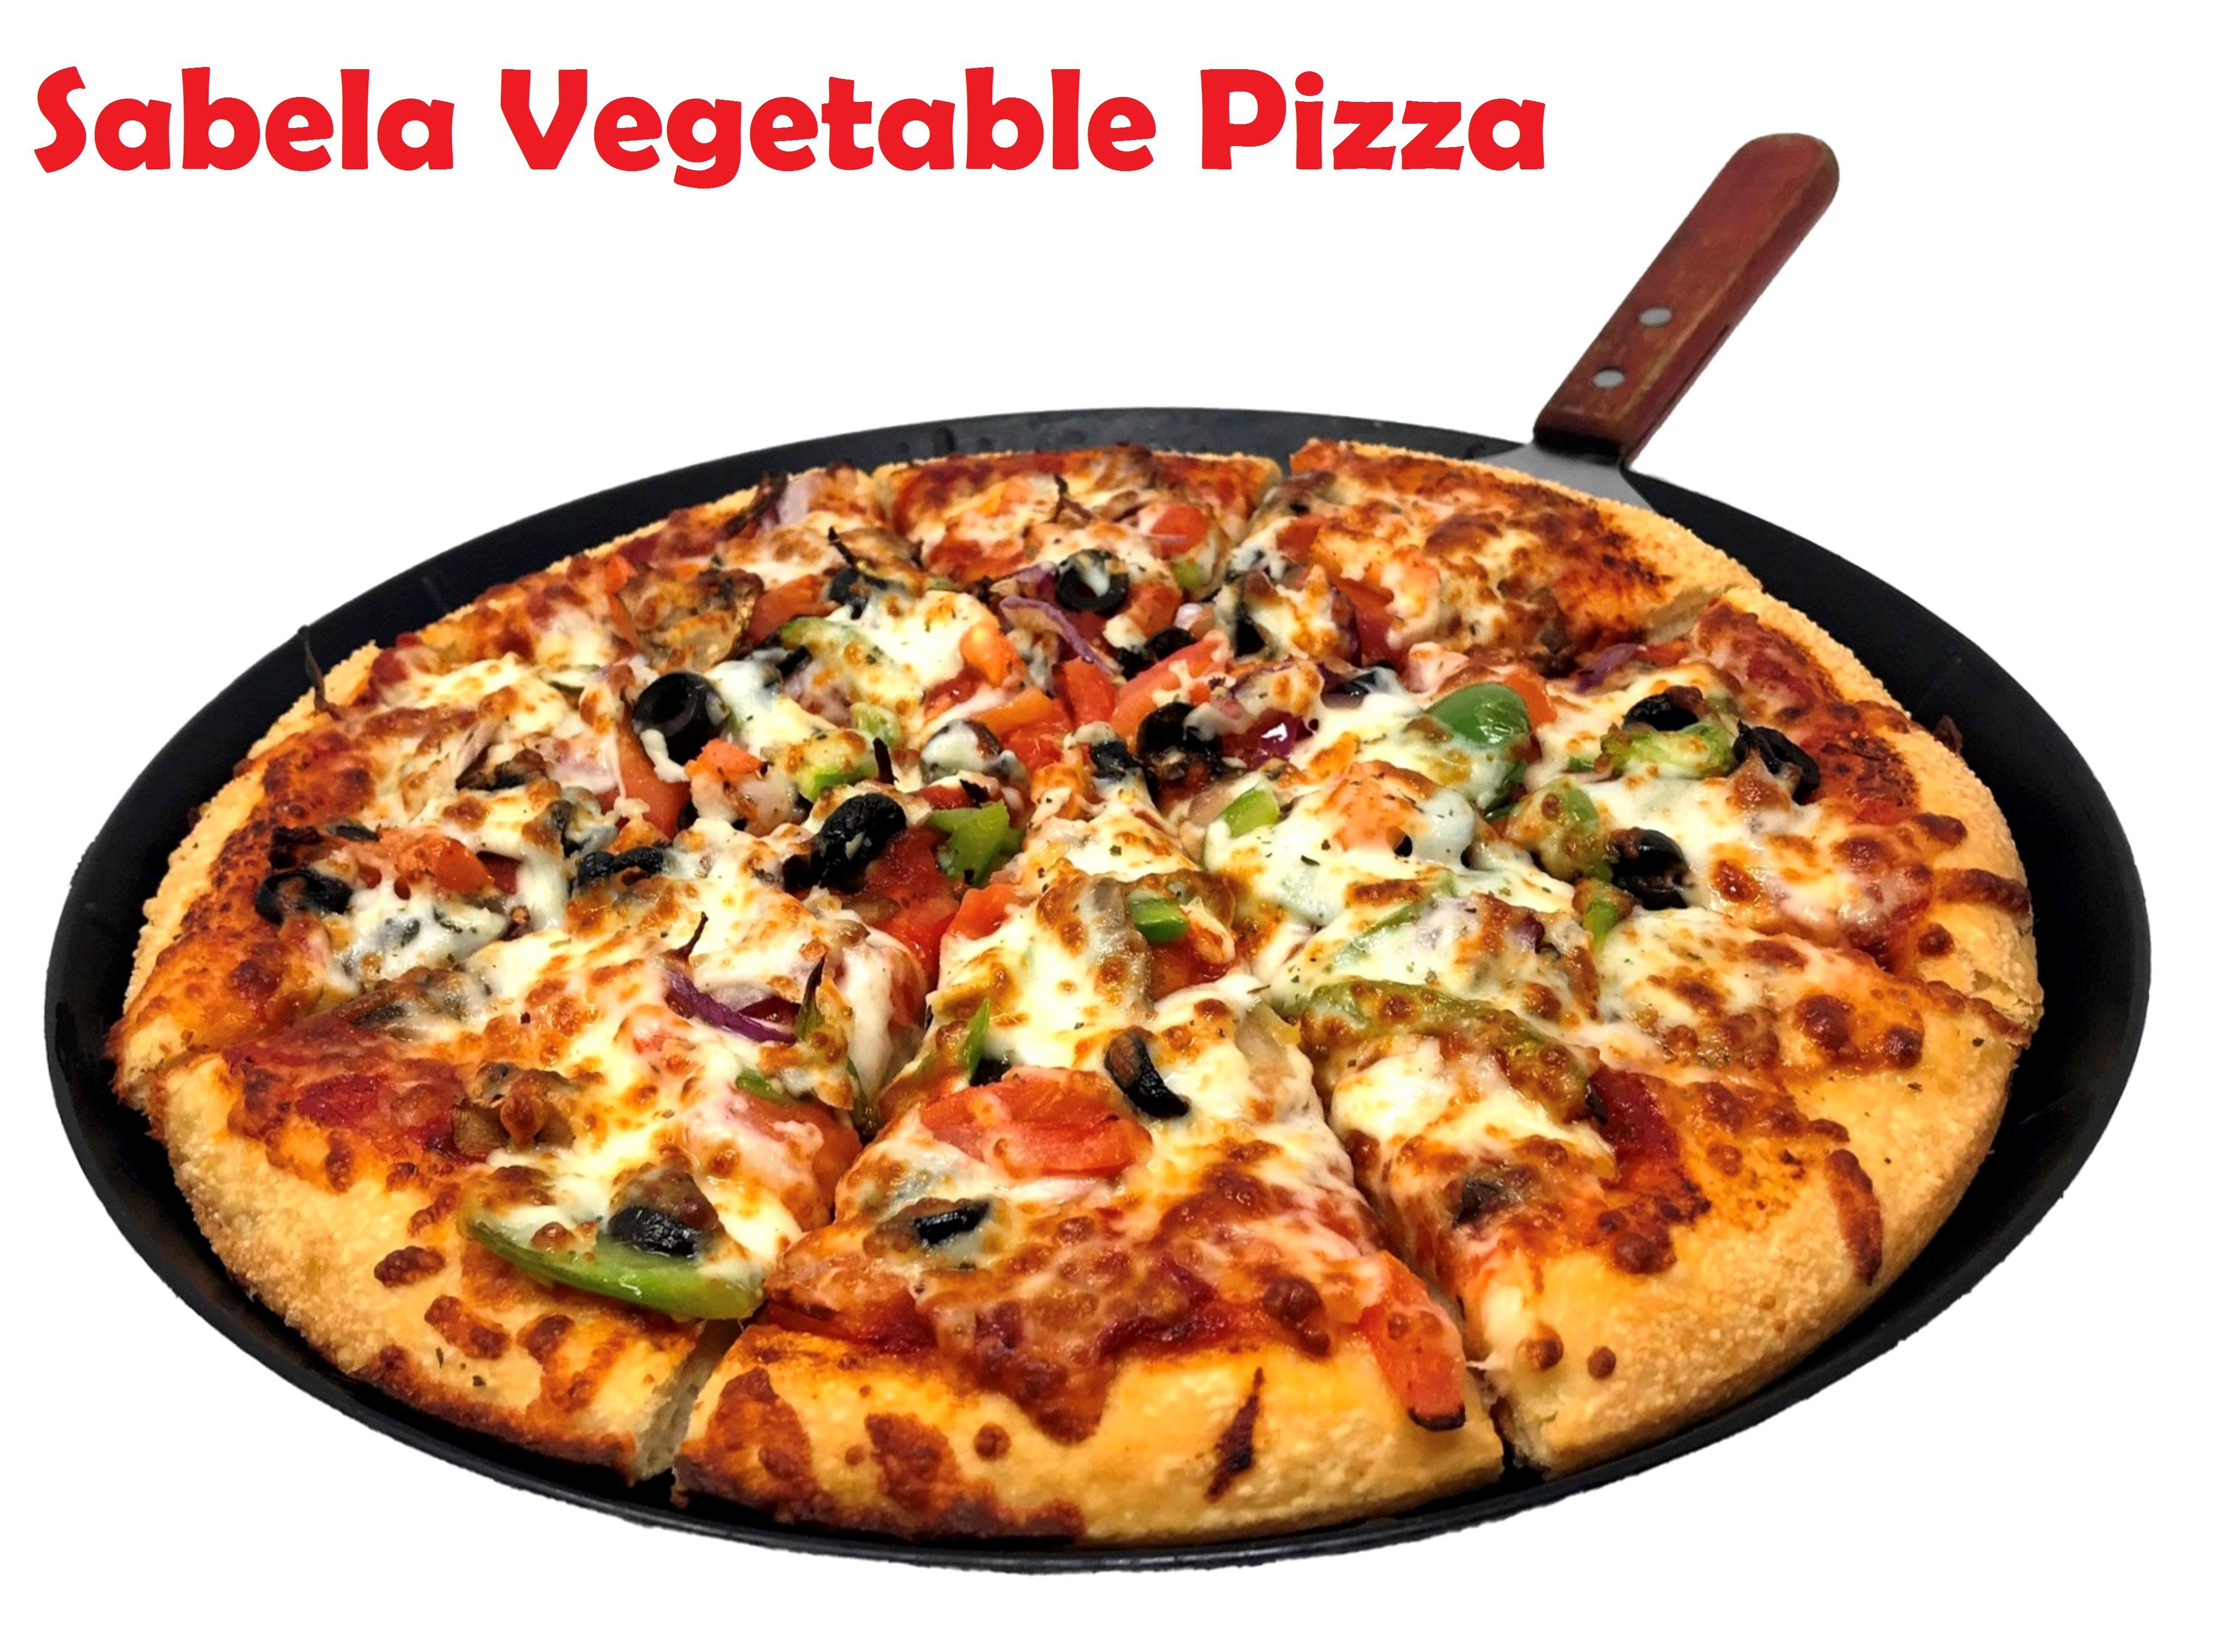 Pin By Brizio S Pizza On Pizza Good Pizza Pizza Restaurant Pizza Home Delivery